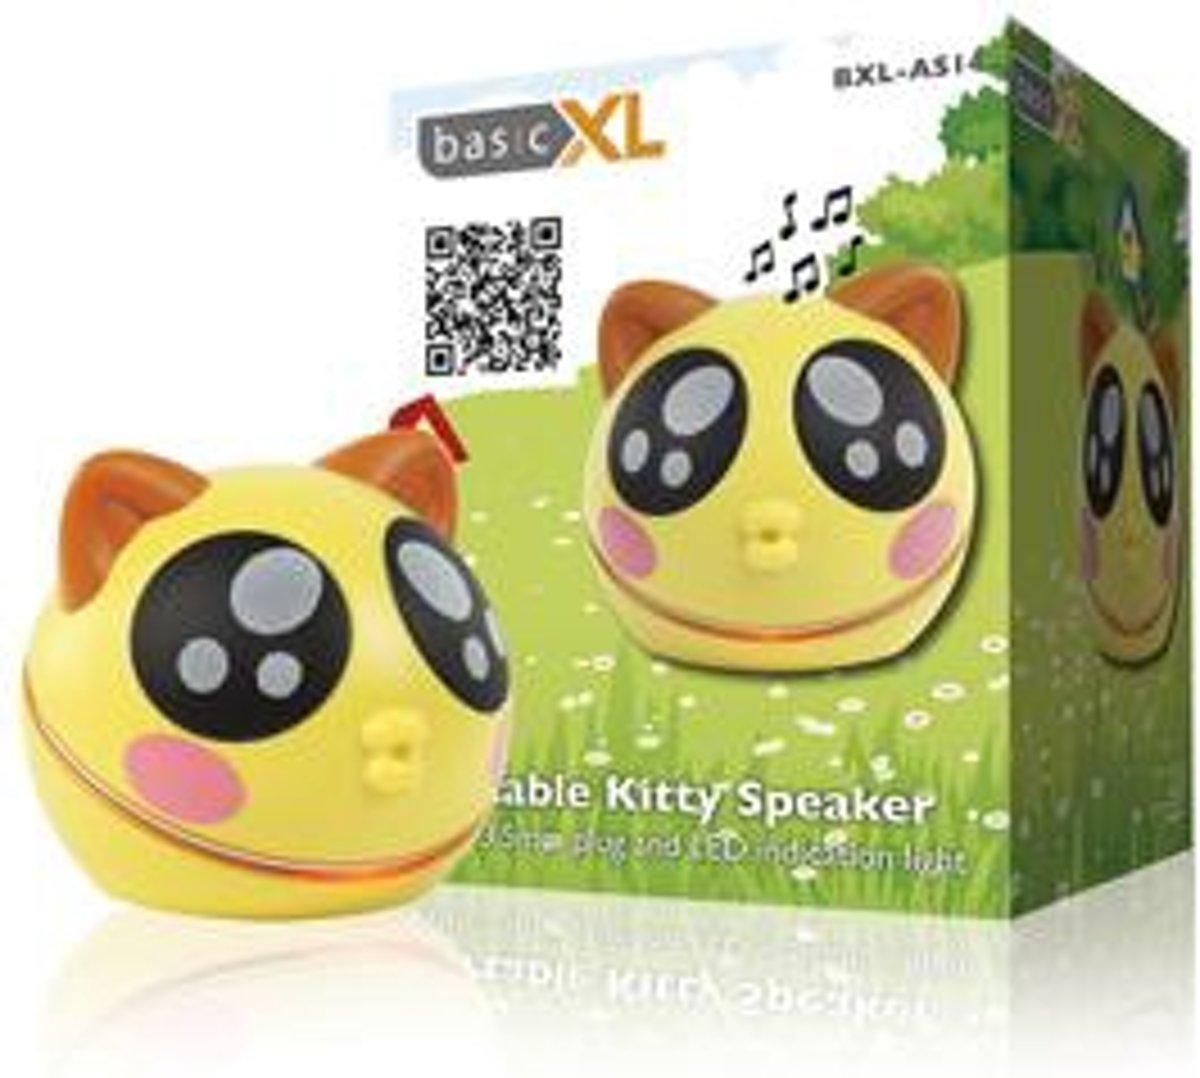 Basic XL, Draagbare Kat Speaker kopen